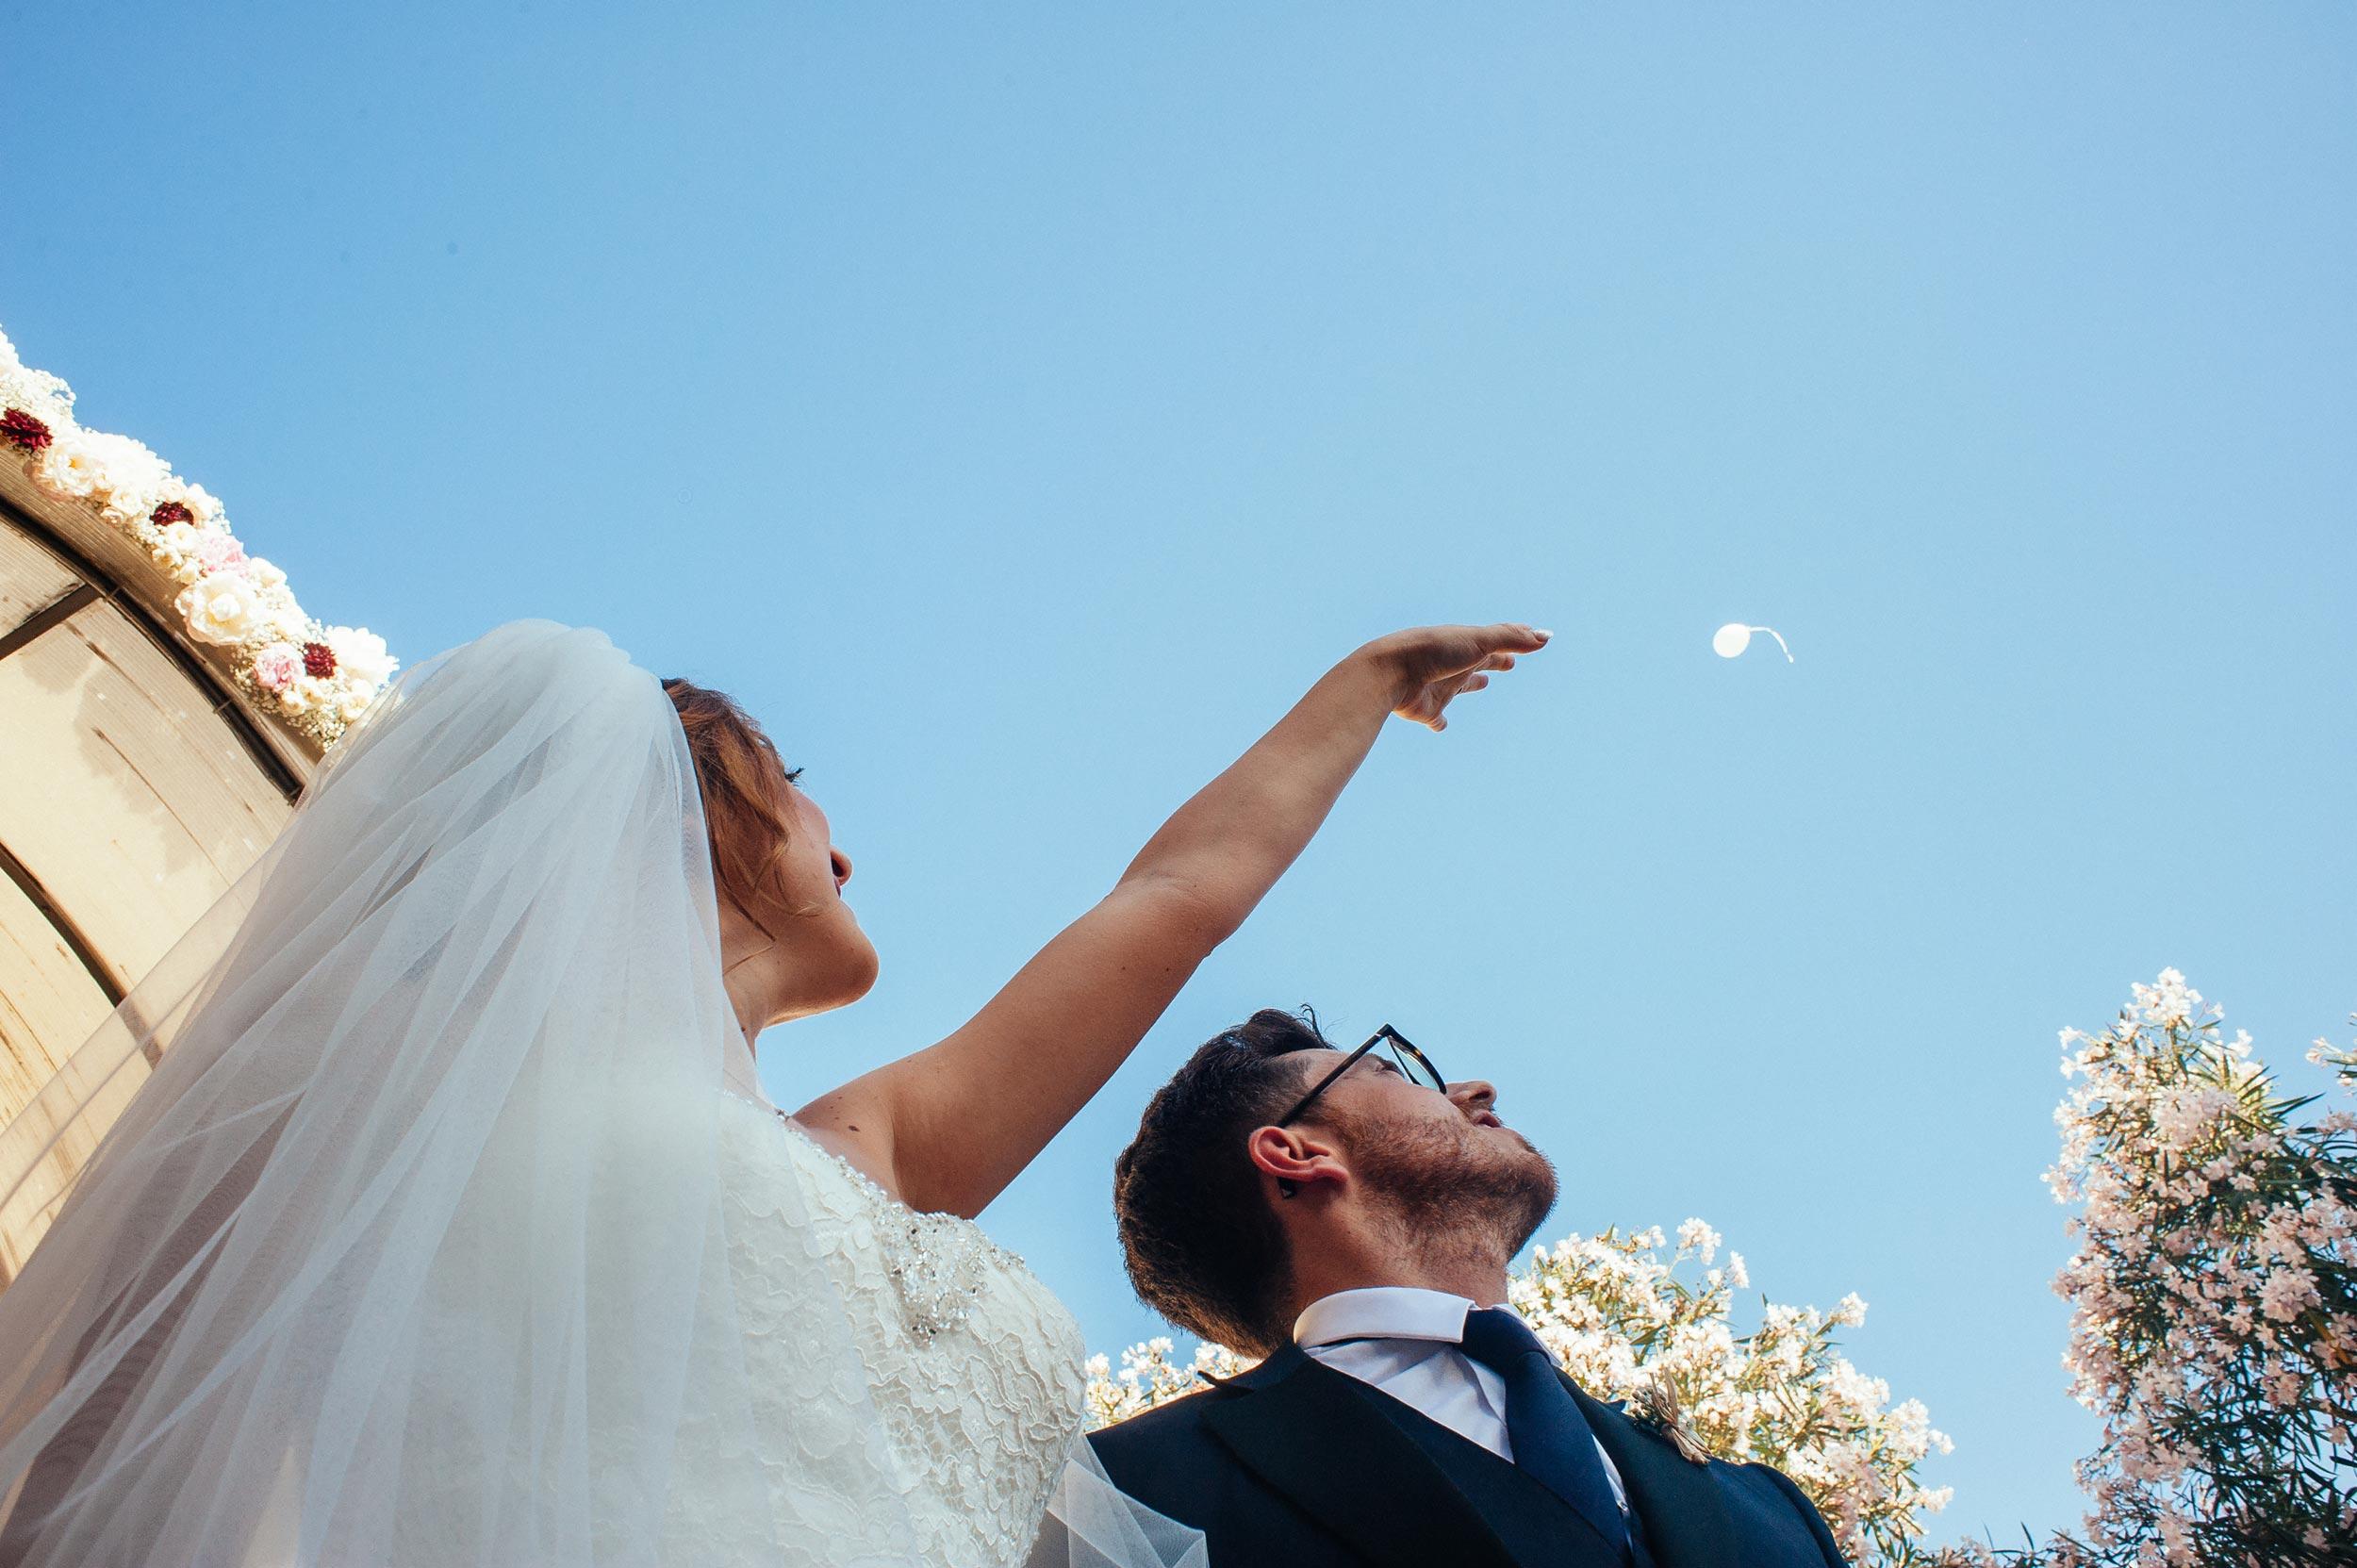 2016-Claudio-Teresa-Naples-Wedding-Photographer-Italy-Alessandro-Avenali-58.jpg